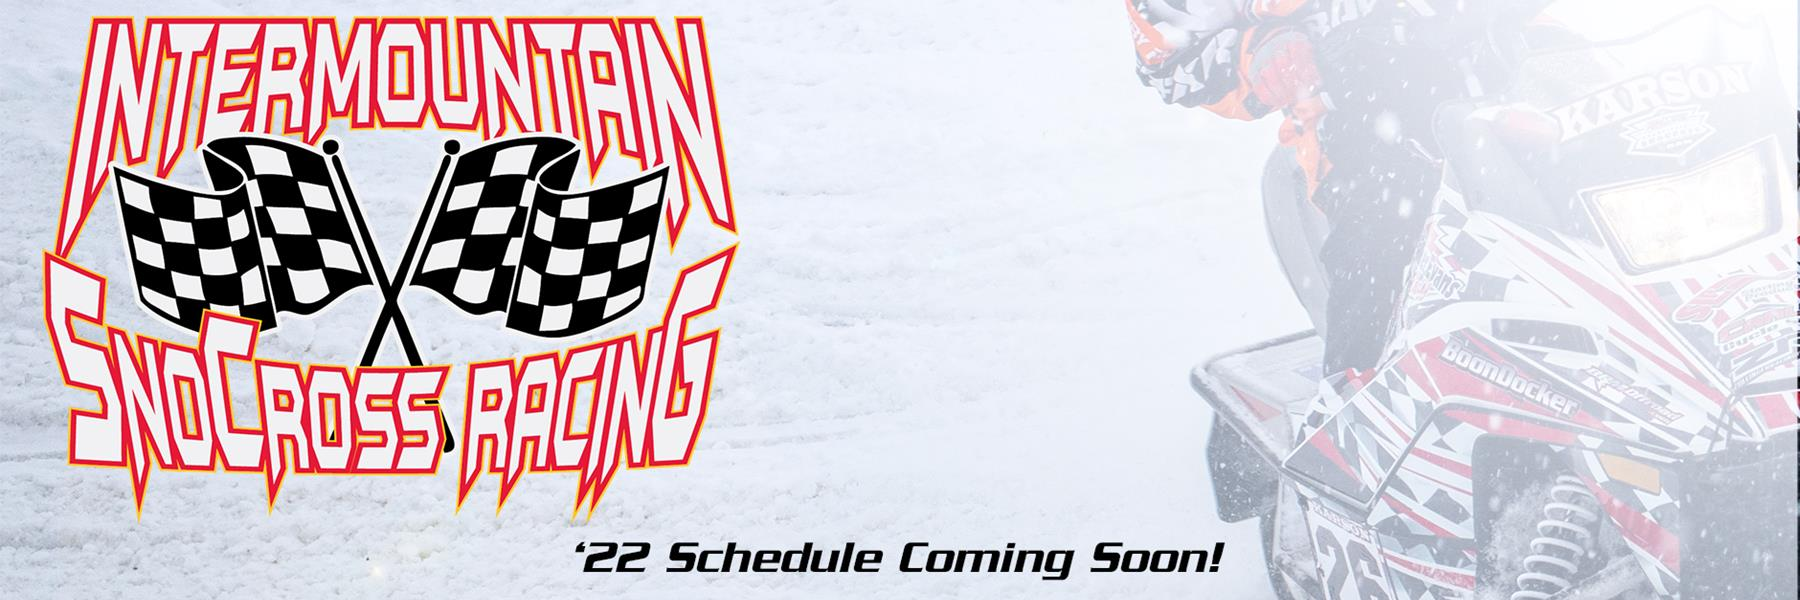 Intermountain Snocross Racing